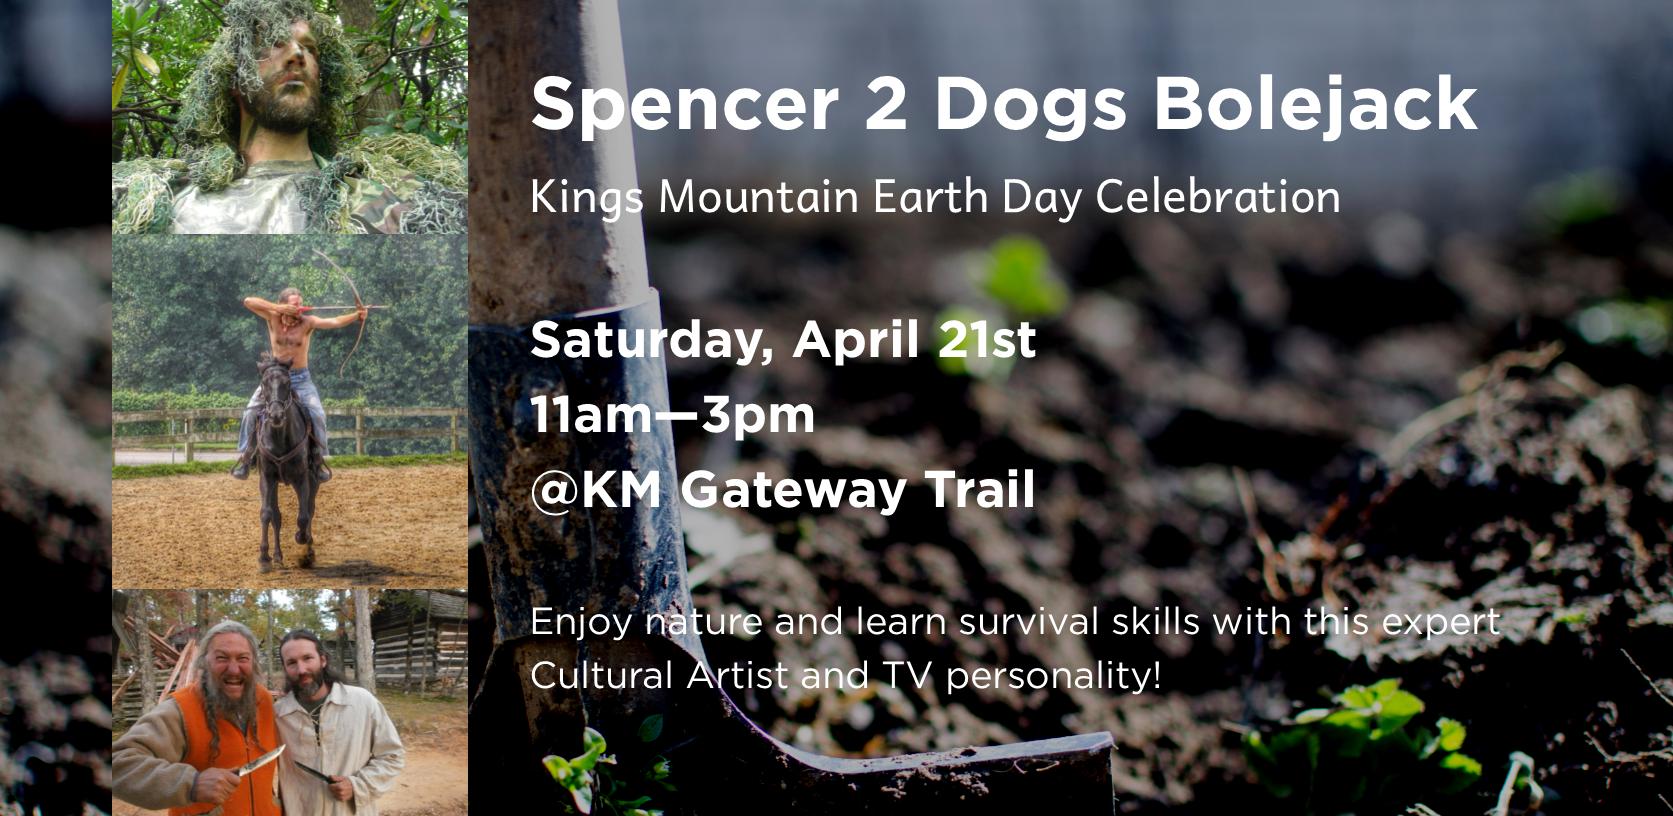 Spencer 2 Dogs Bolejack: Kings Mountain Earth Day Celebration